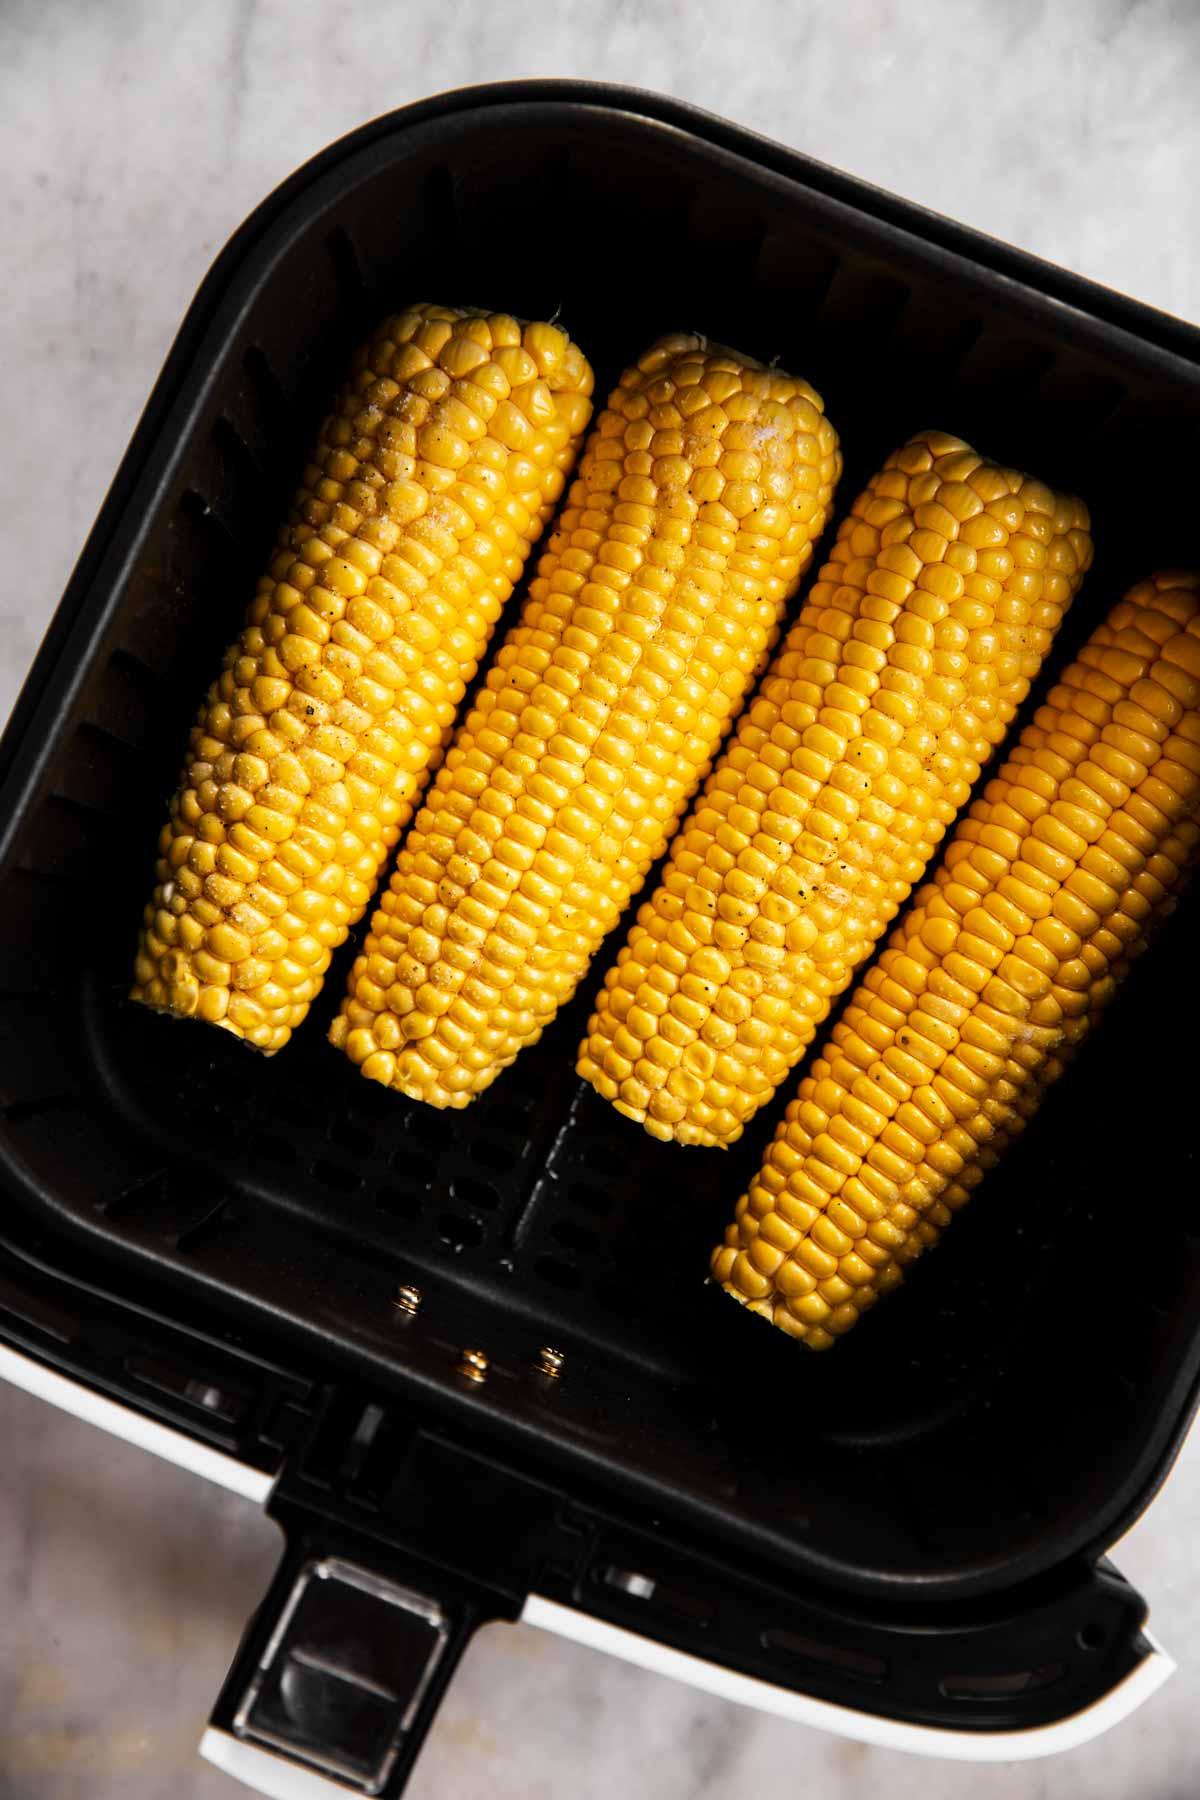 four seasoned ears of corn in air fryer basket